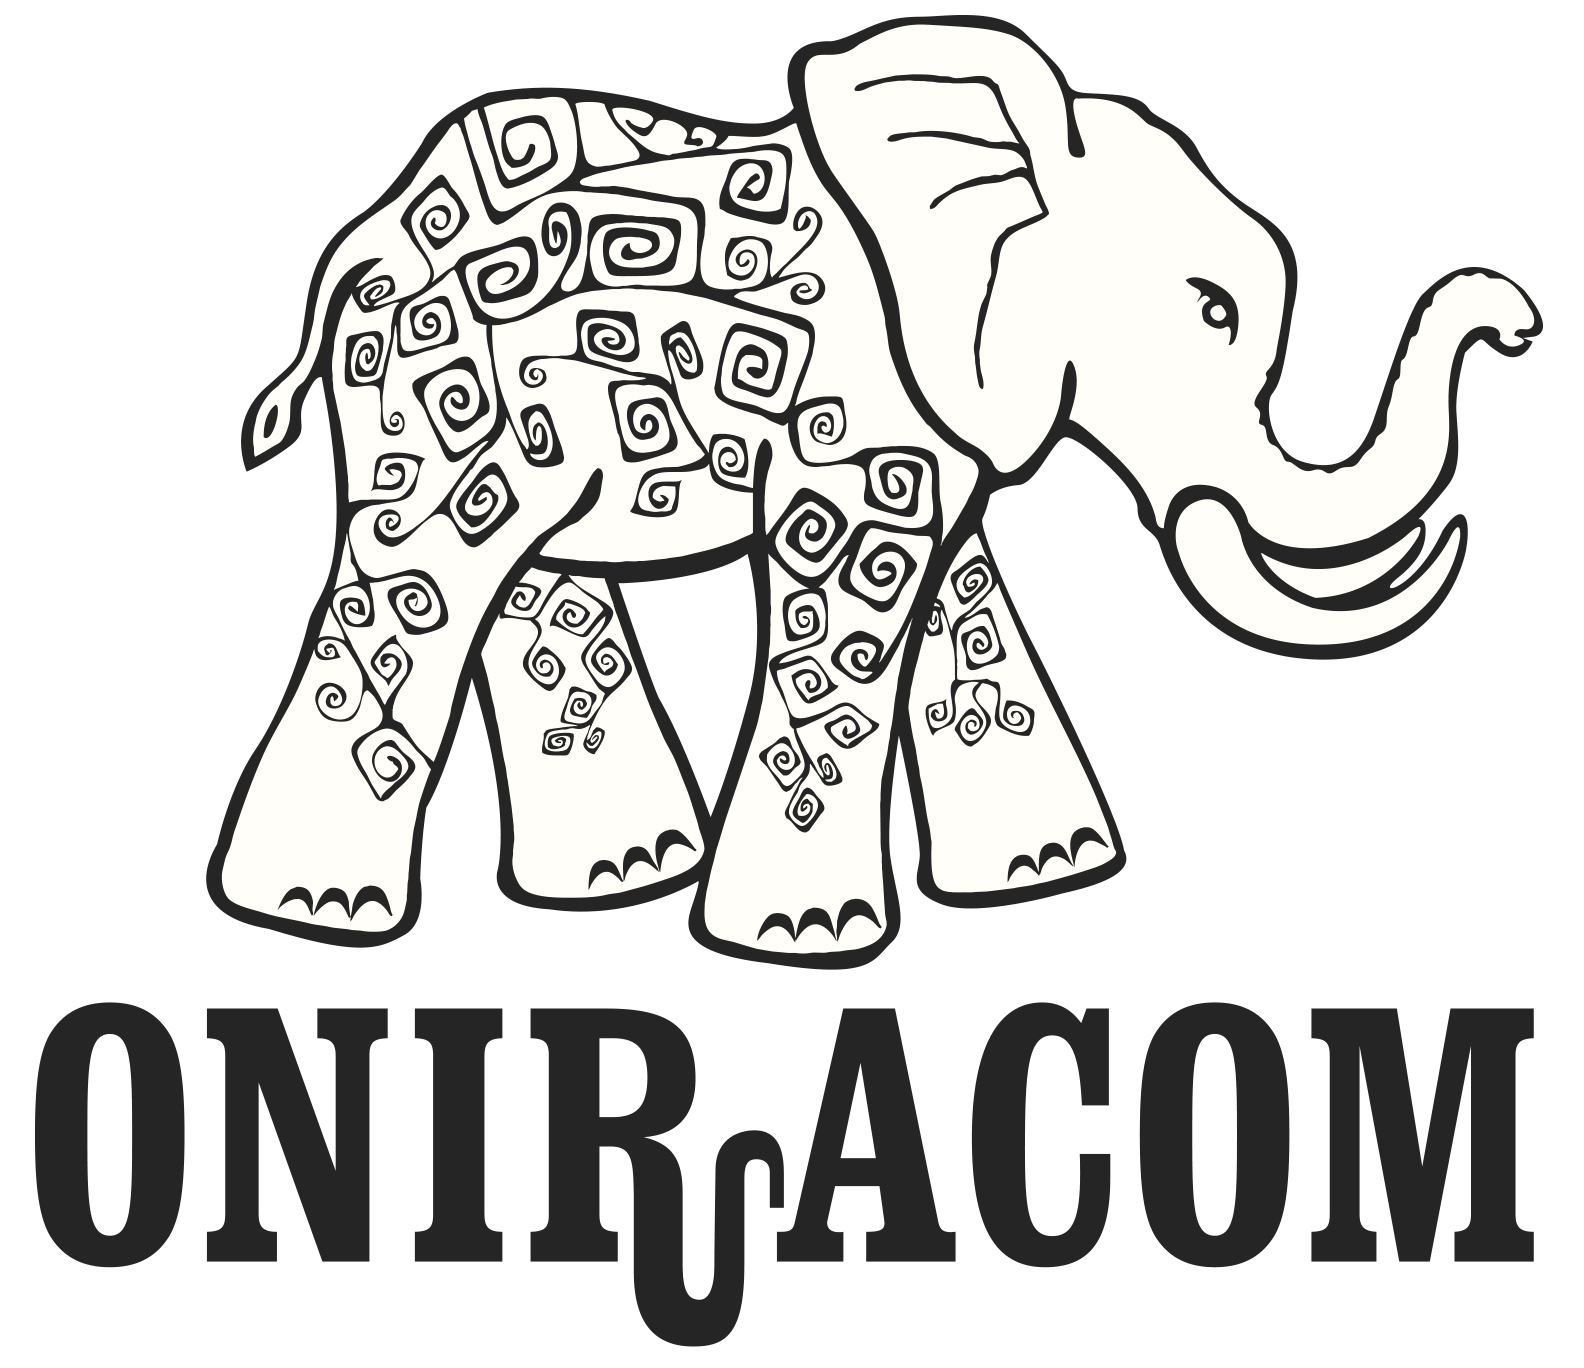 Oniracom-Logo-4Color-Vert-noslogan--rwrwrw.png